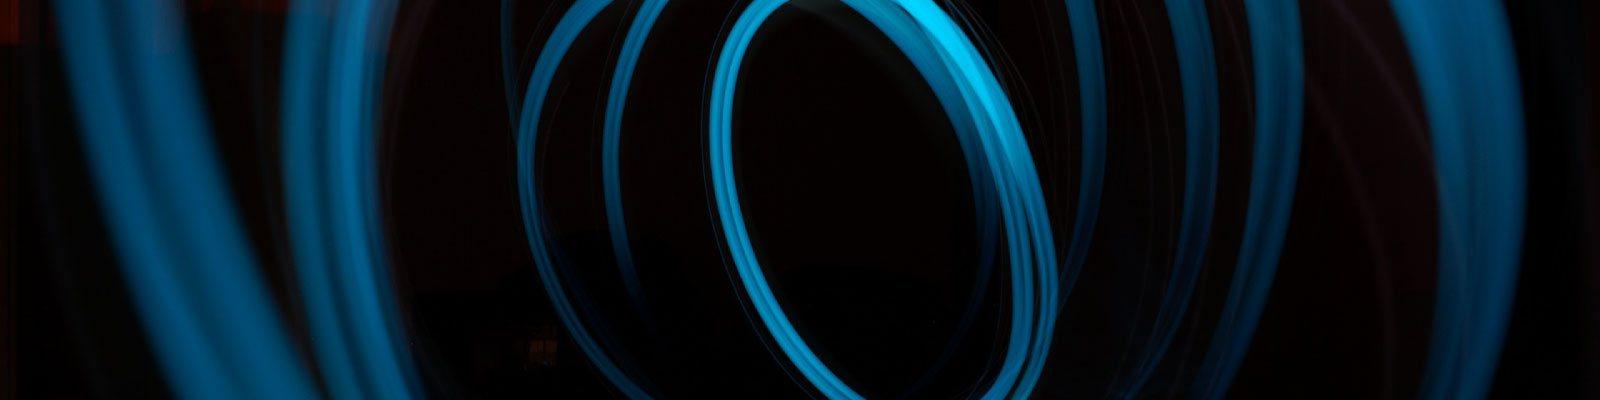 blue fiber optic lights swirling on black background